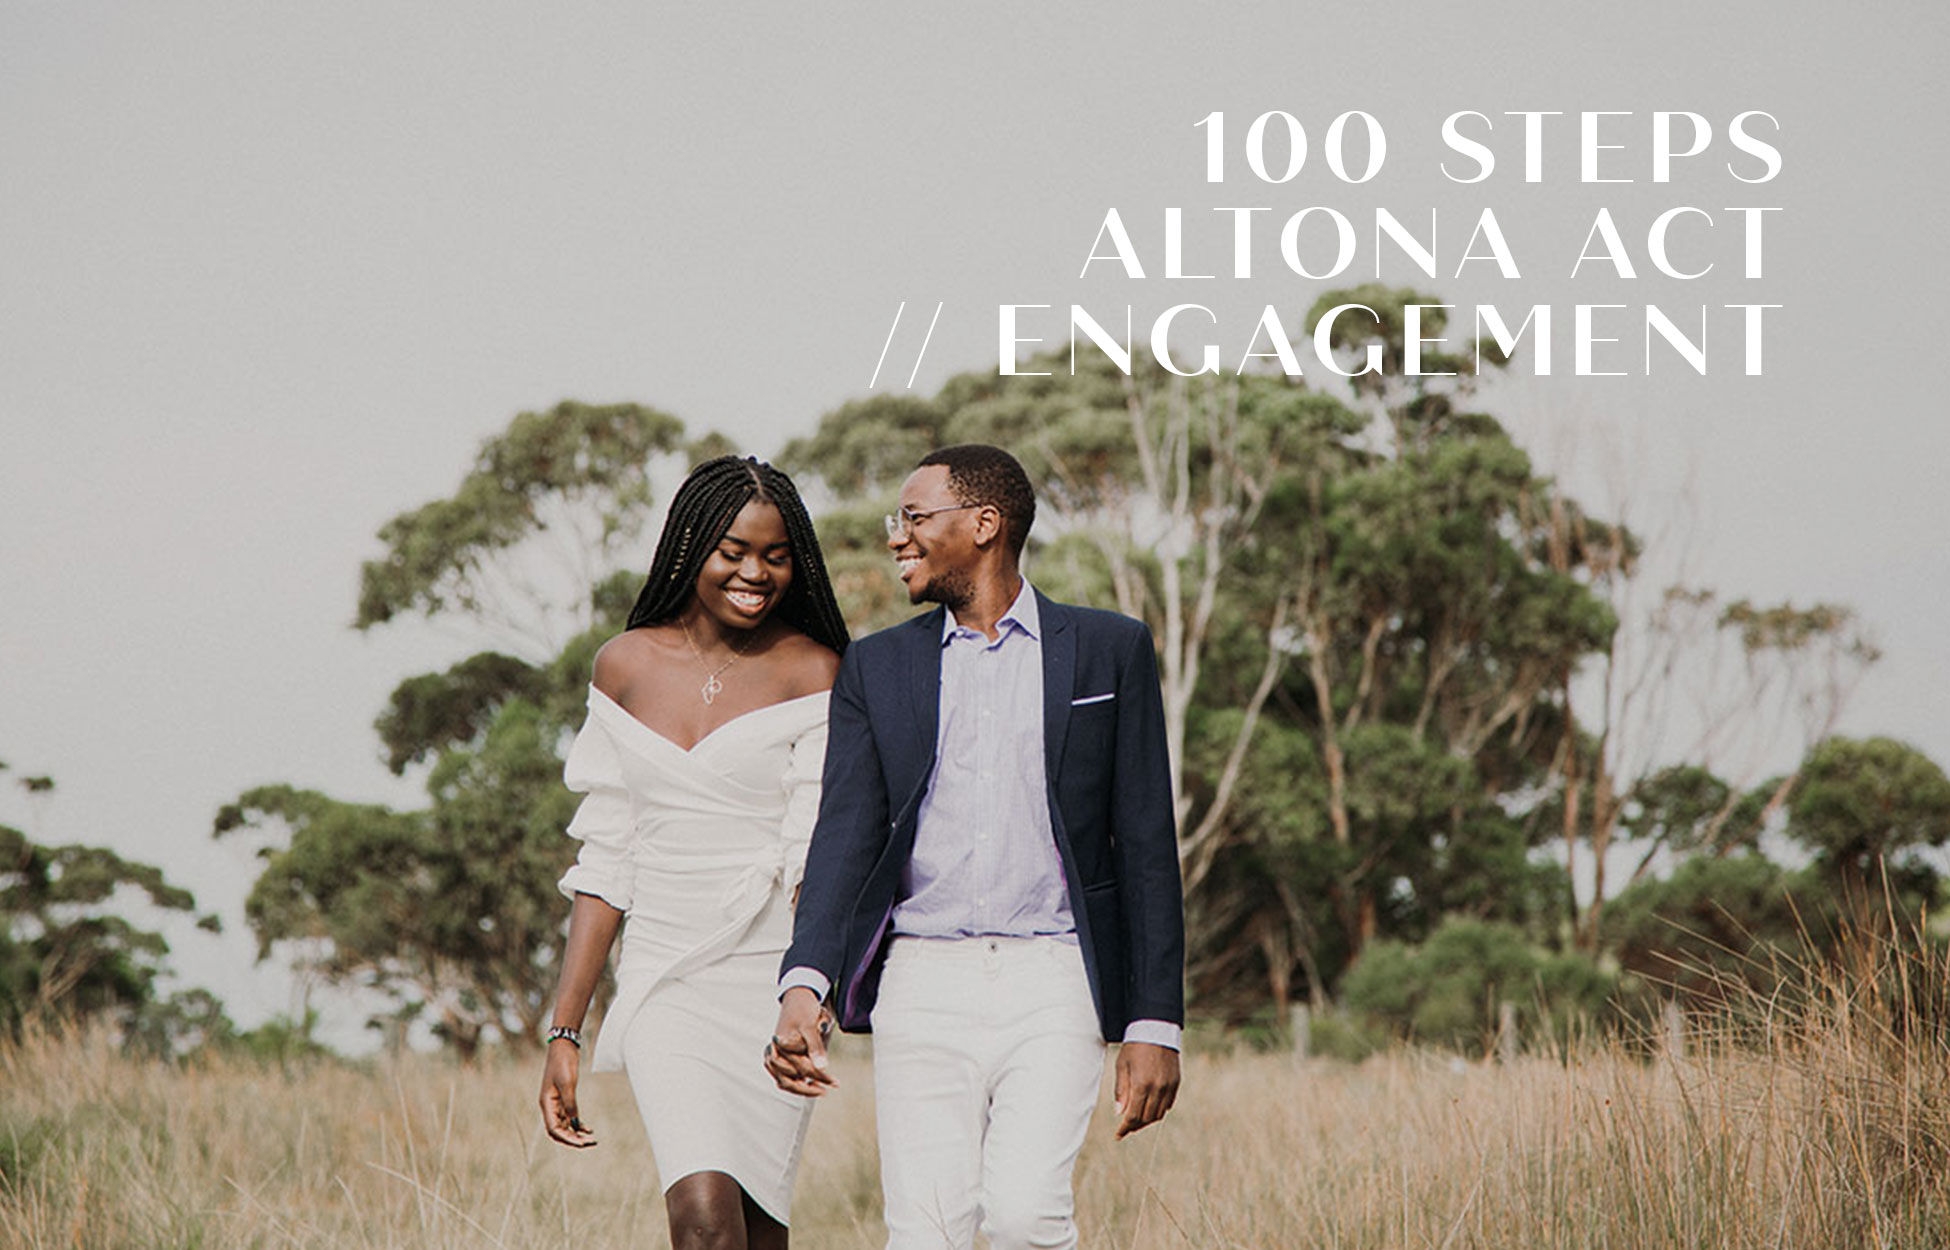 Engagement photography 100 steps Altona VIC Neil Hole Photography